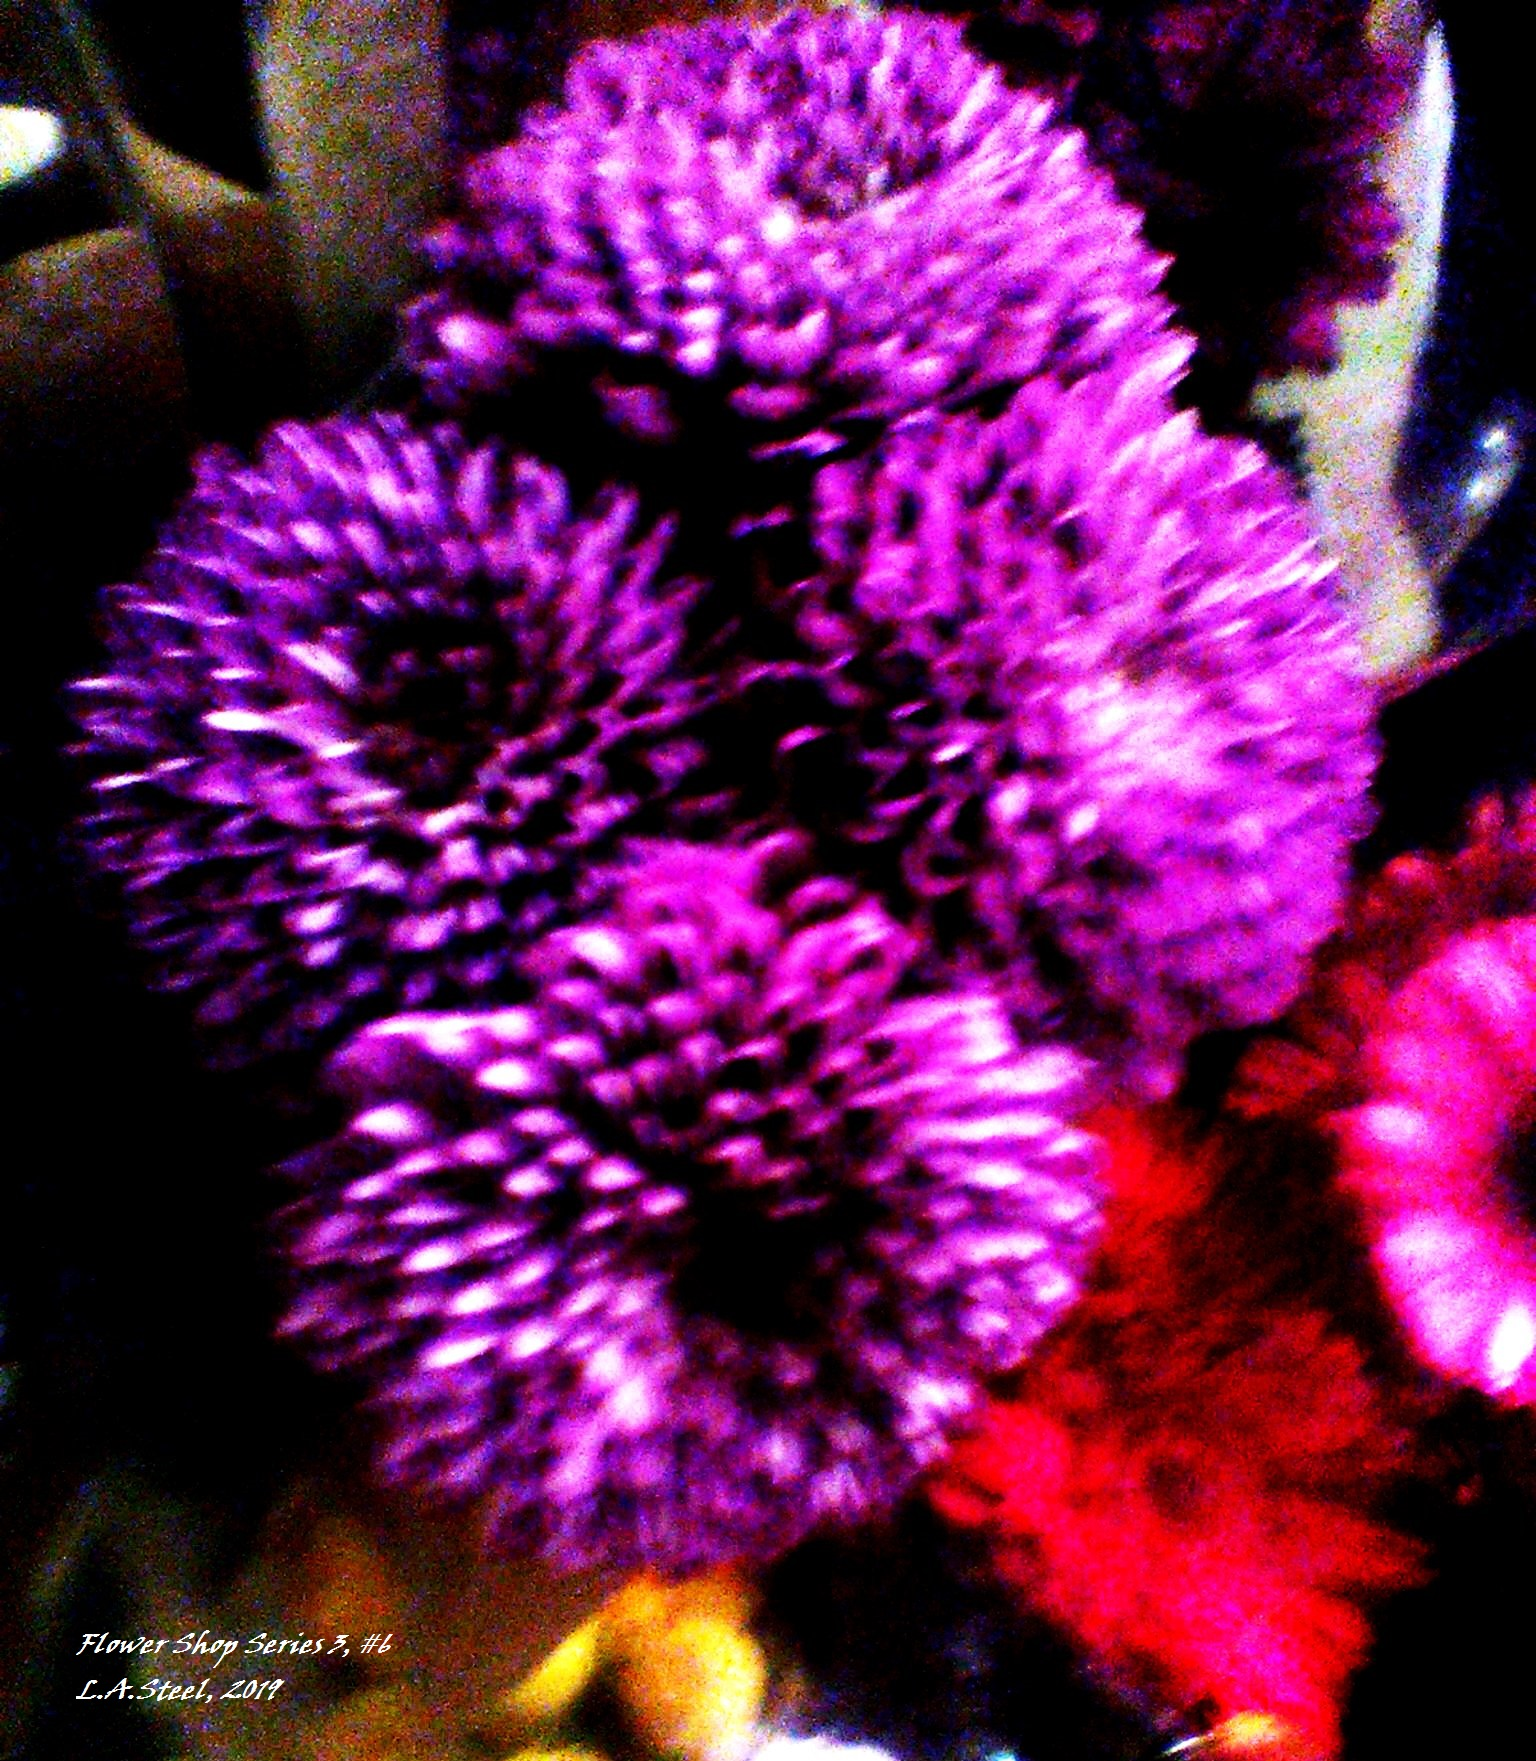 flower shop series 3 6 2019